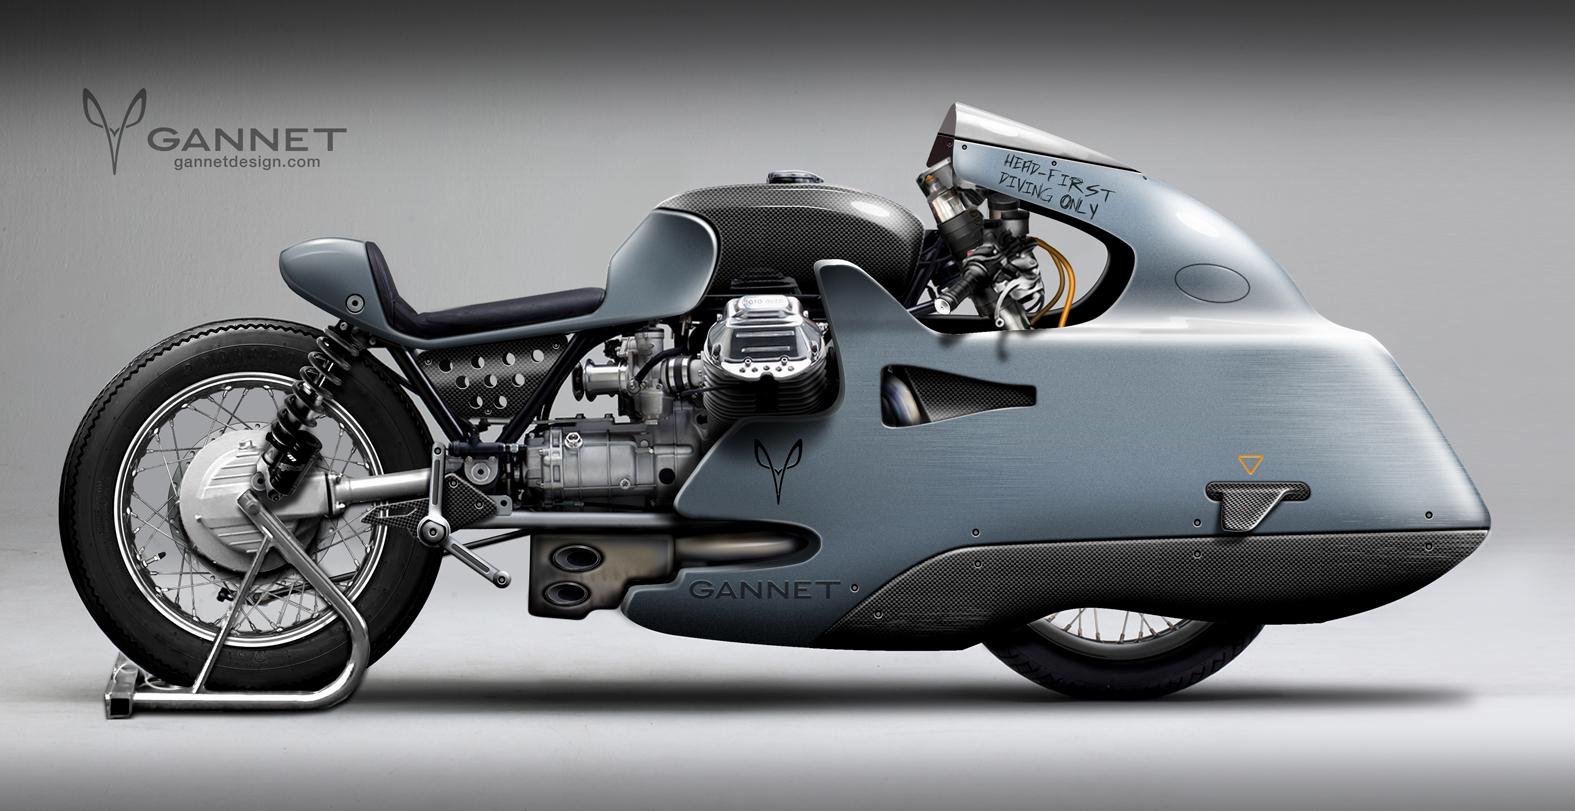 moto guzzi � gannet design